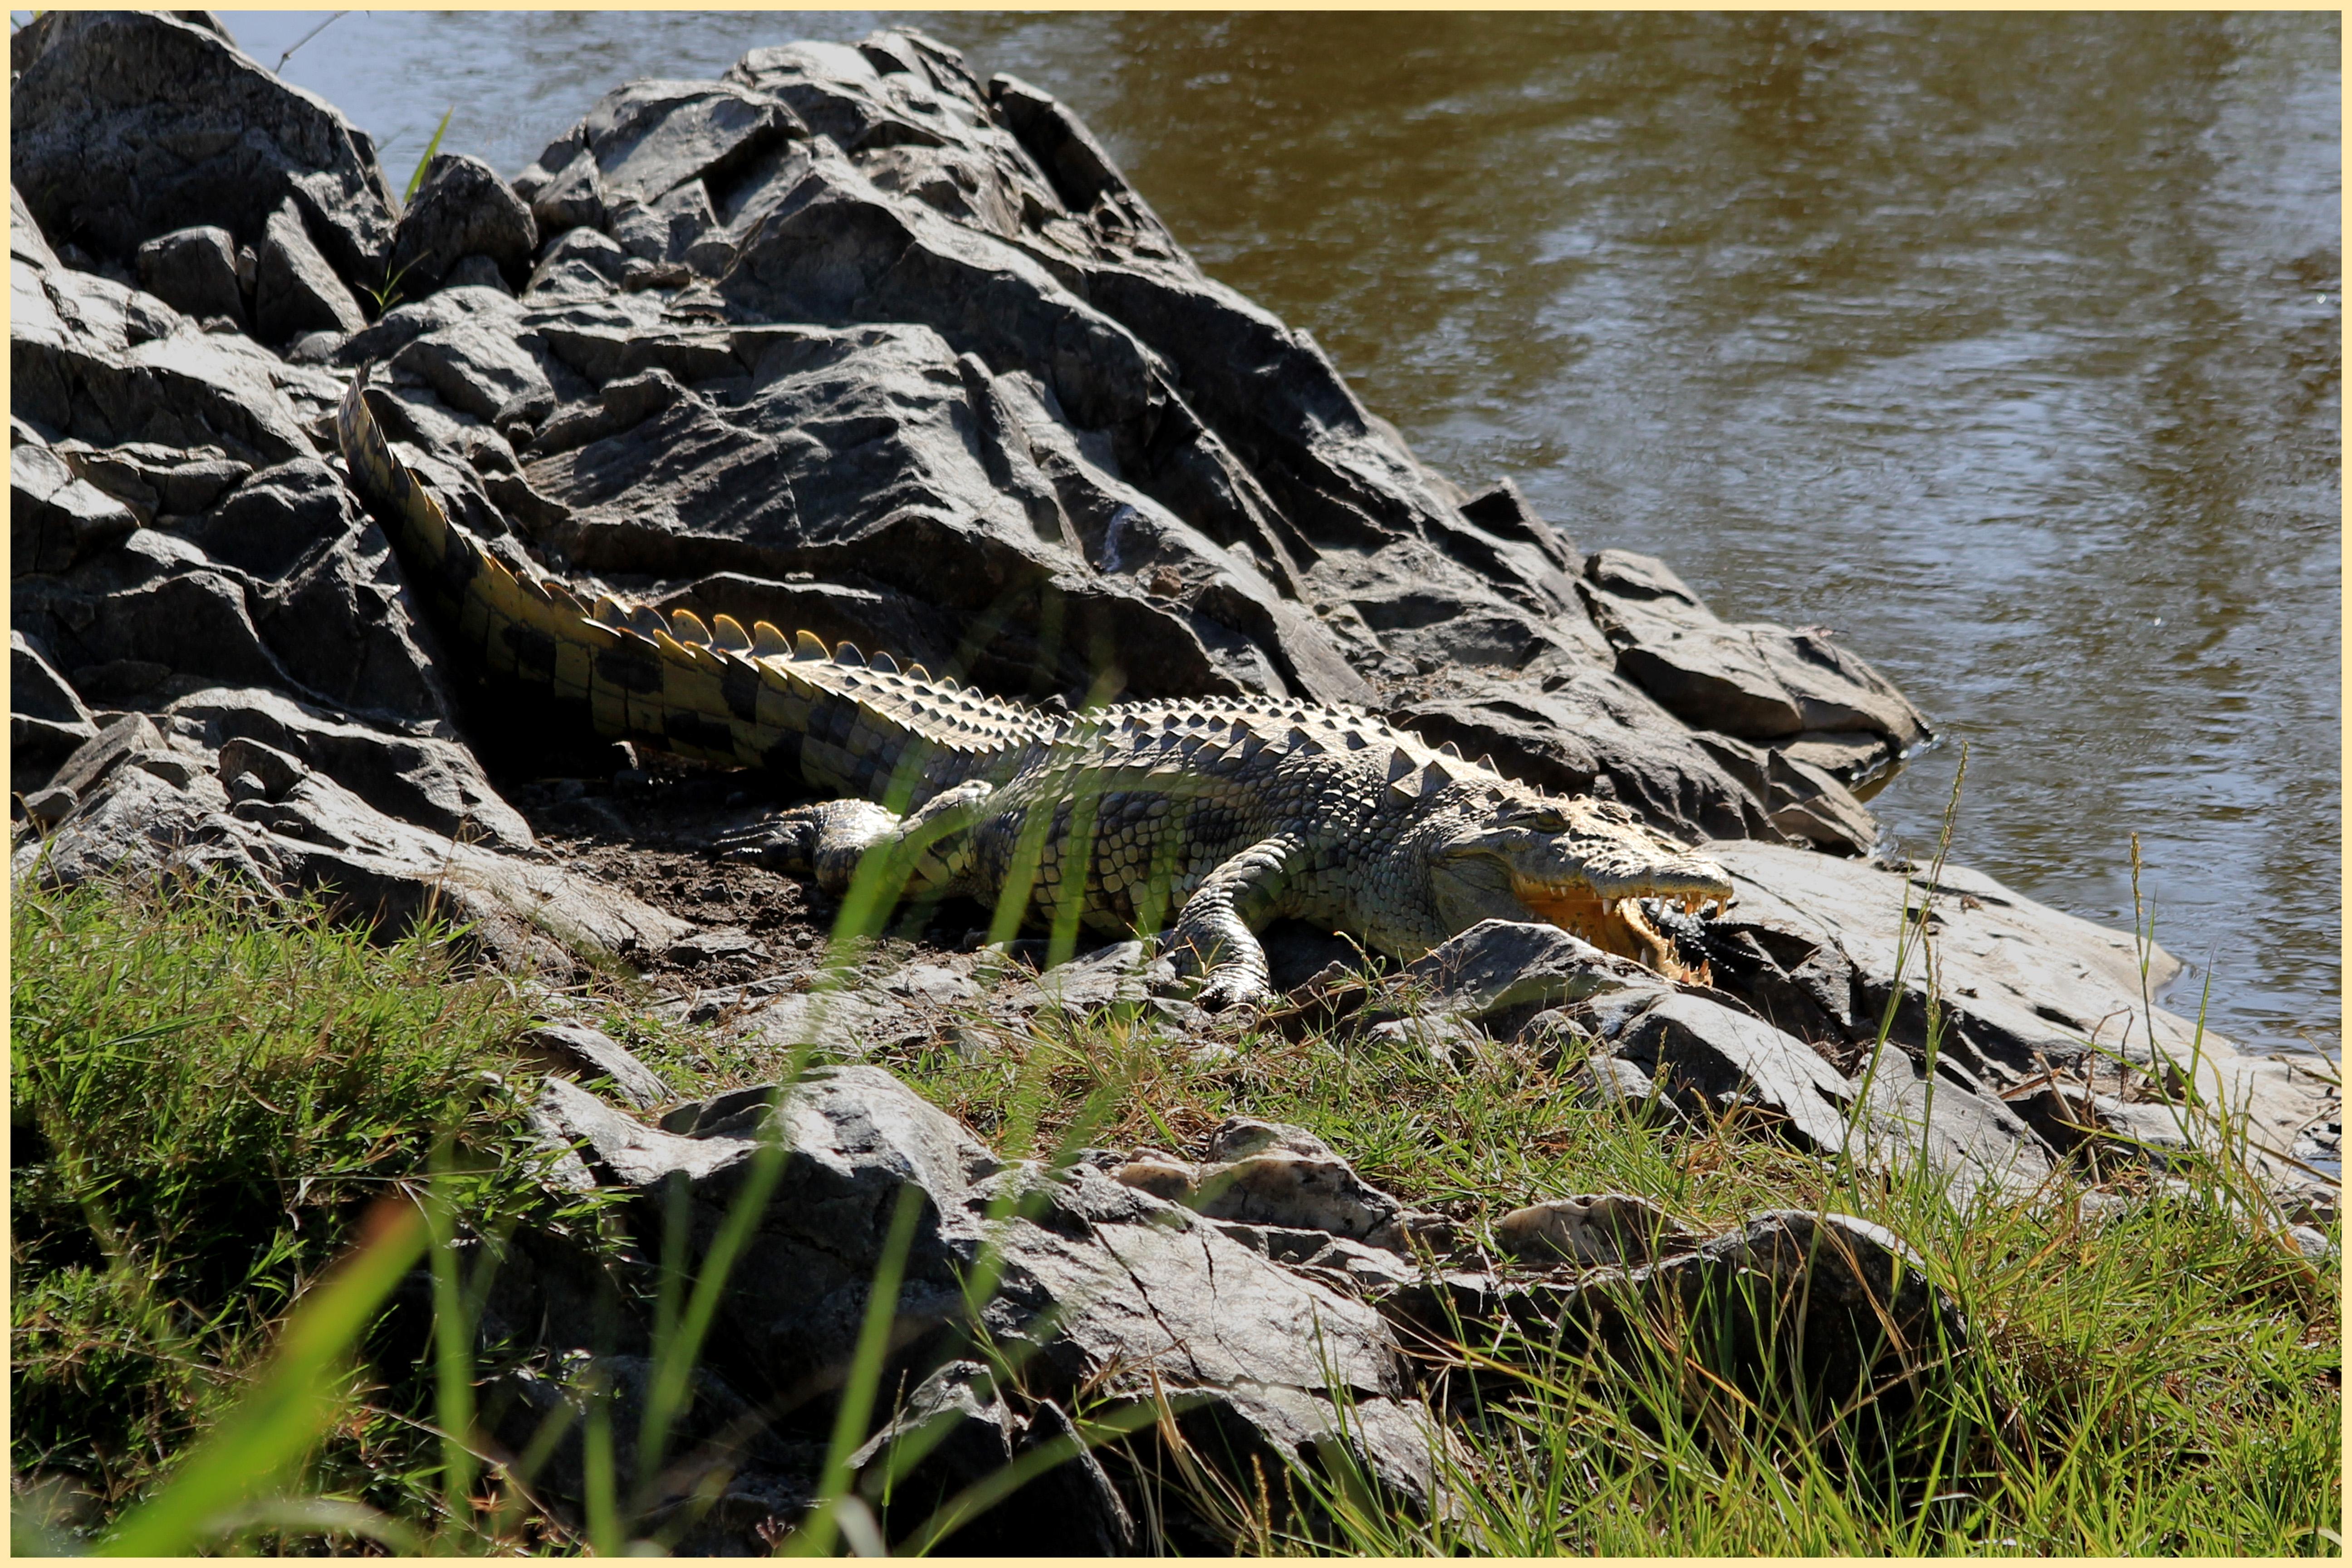 Nile crocodile eating zebra - photo#27